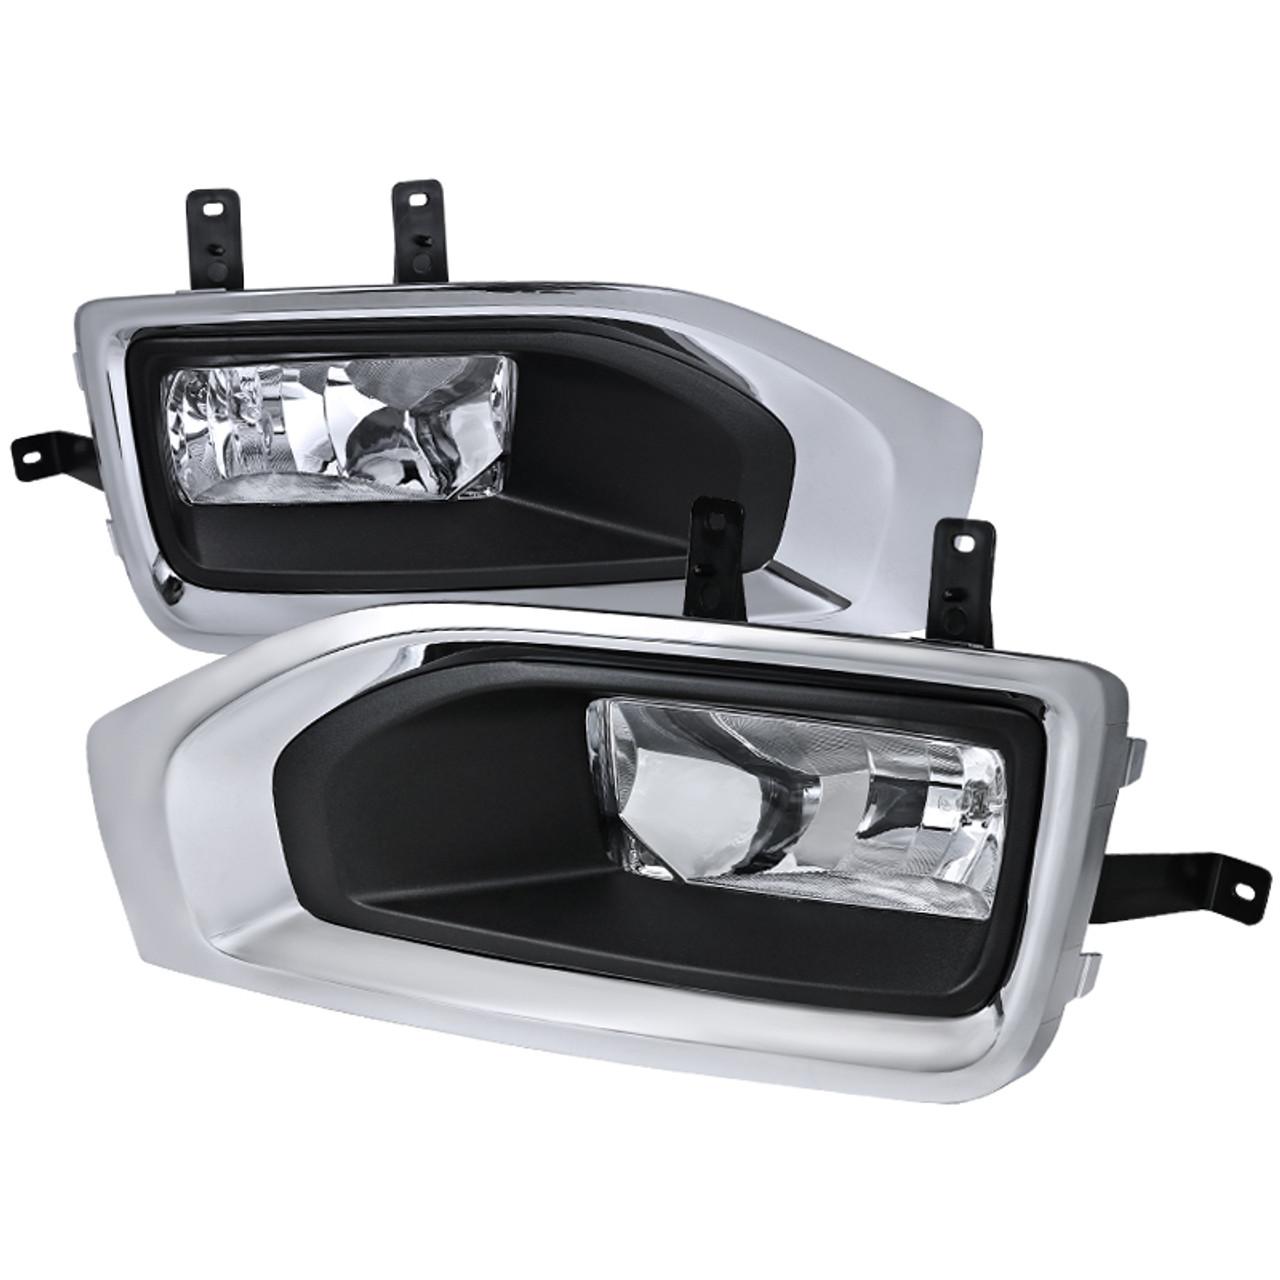 2015 2018 Gmc Yukon Yukon Xl H3 Fog Lights Kit Chrome Housing Clear Lens Spec D Tuning